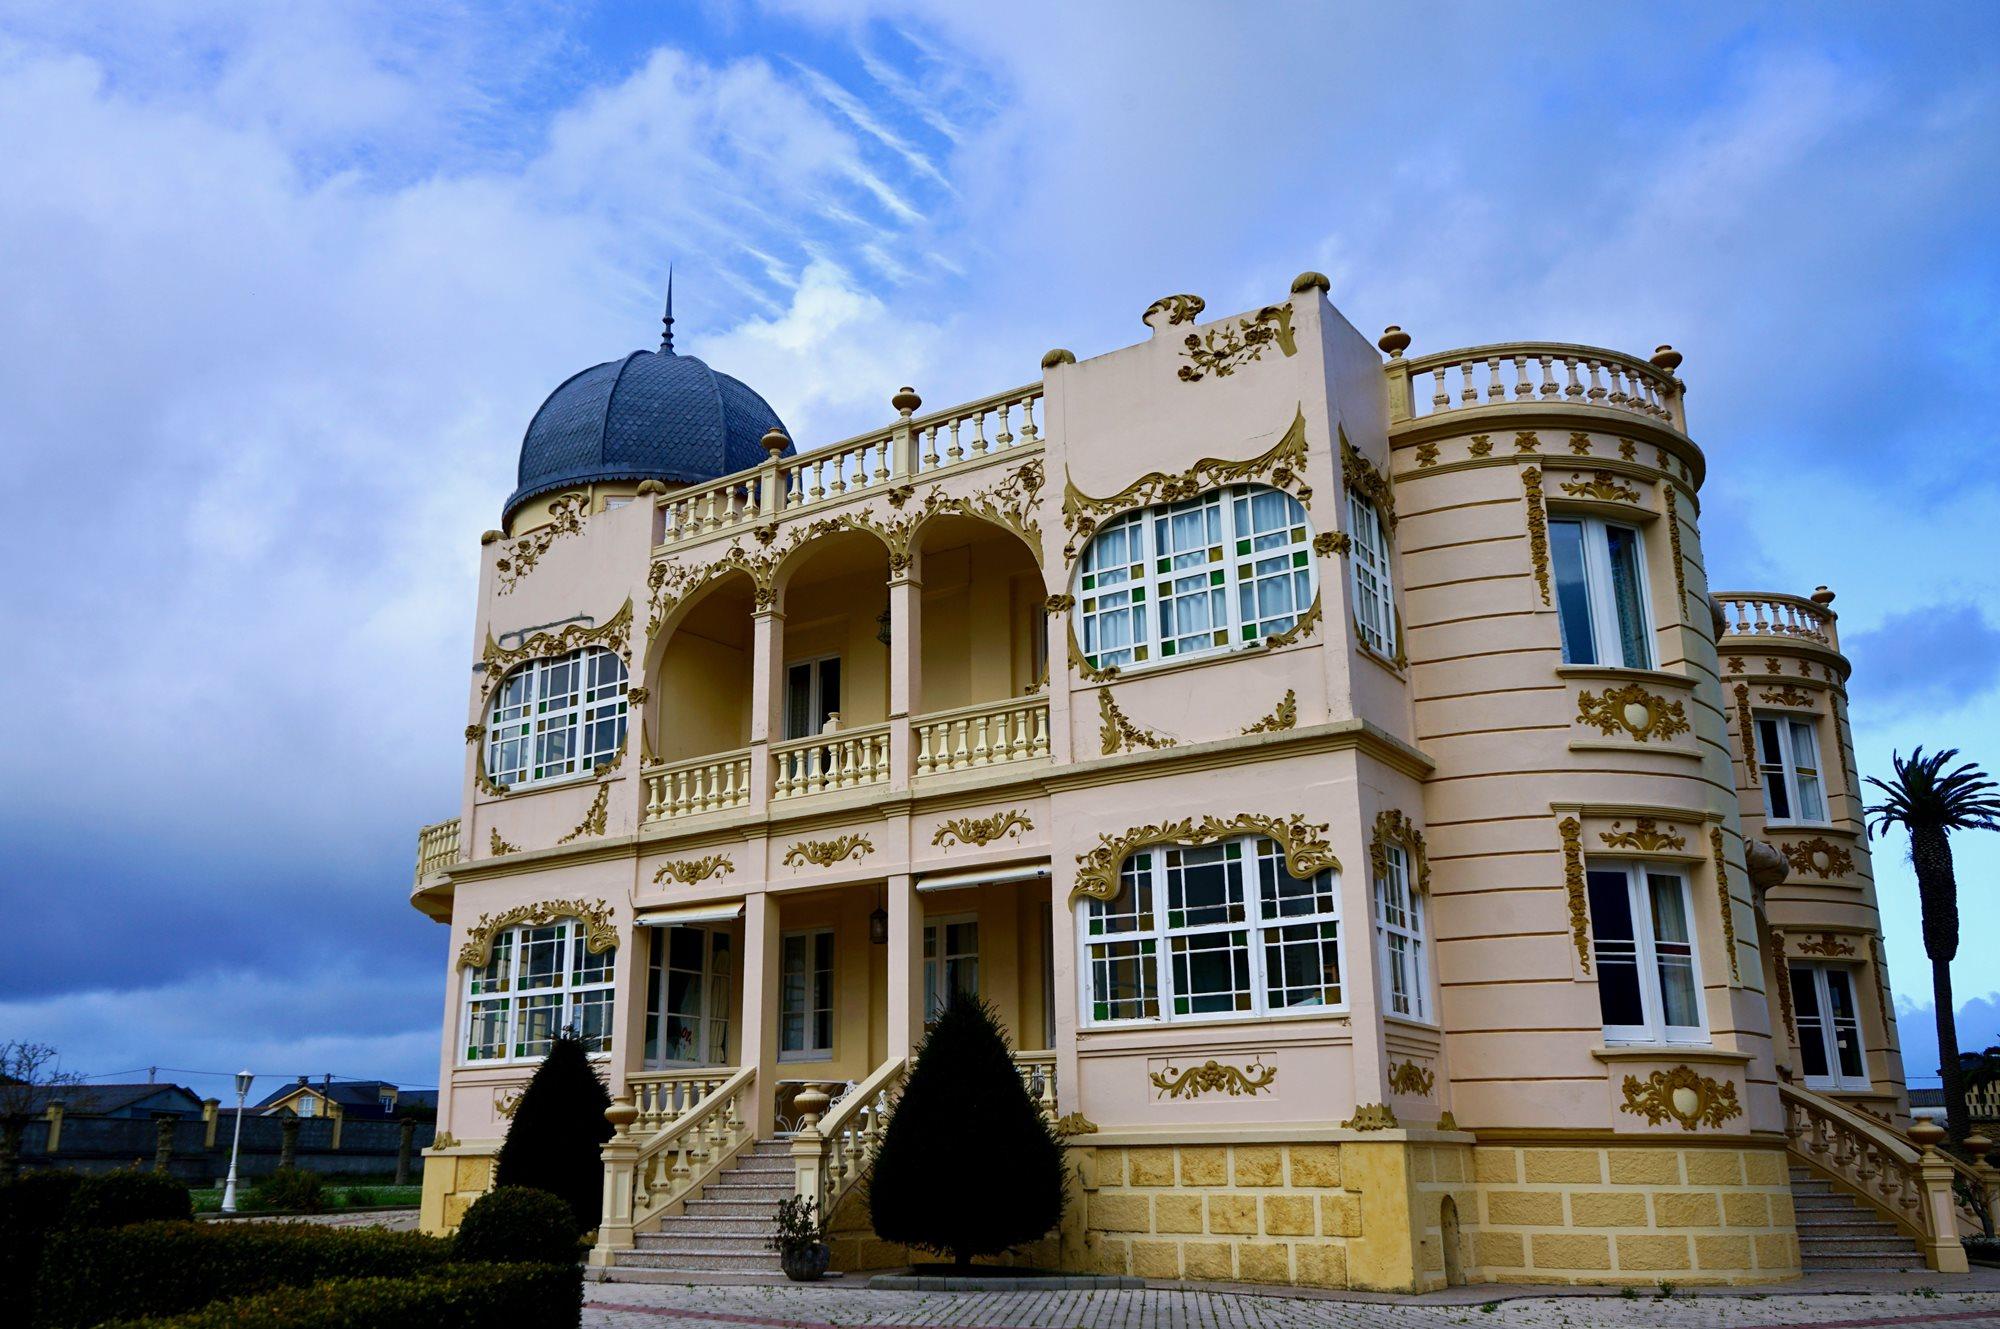 Palacete Peñalba